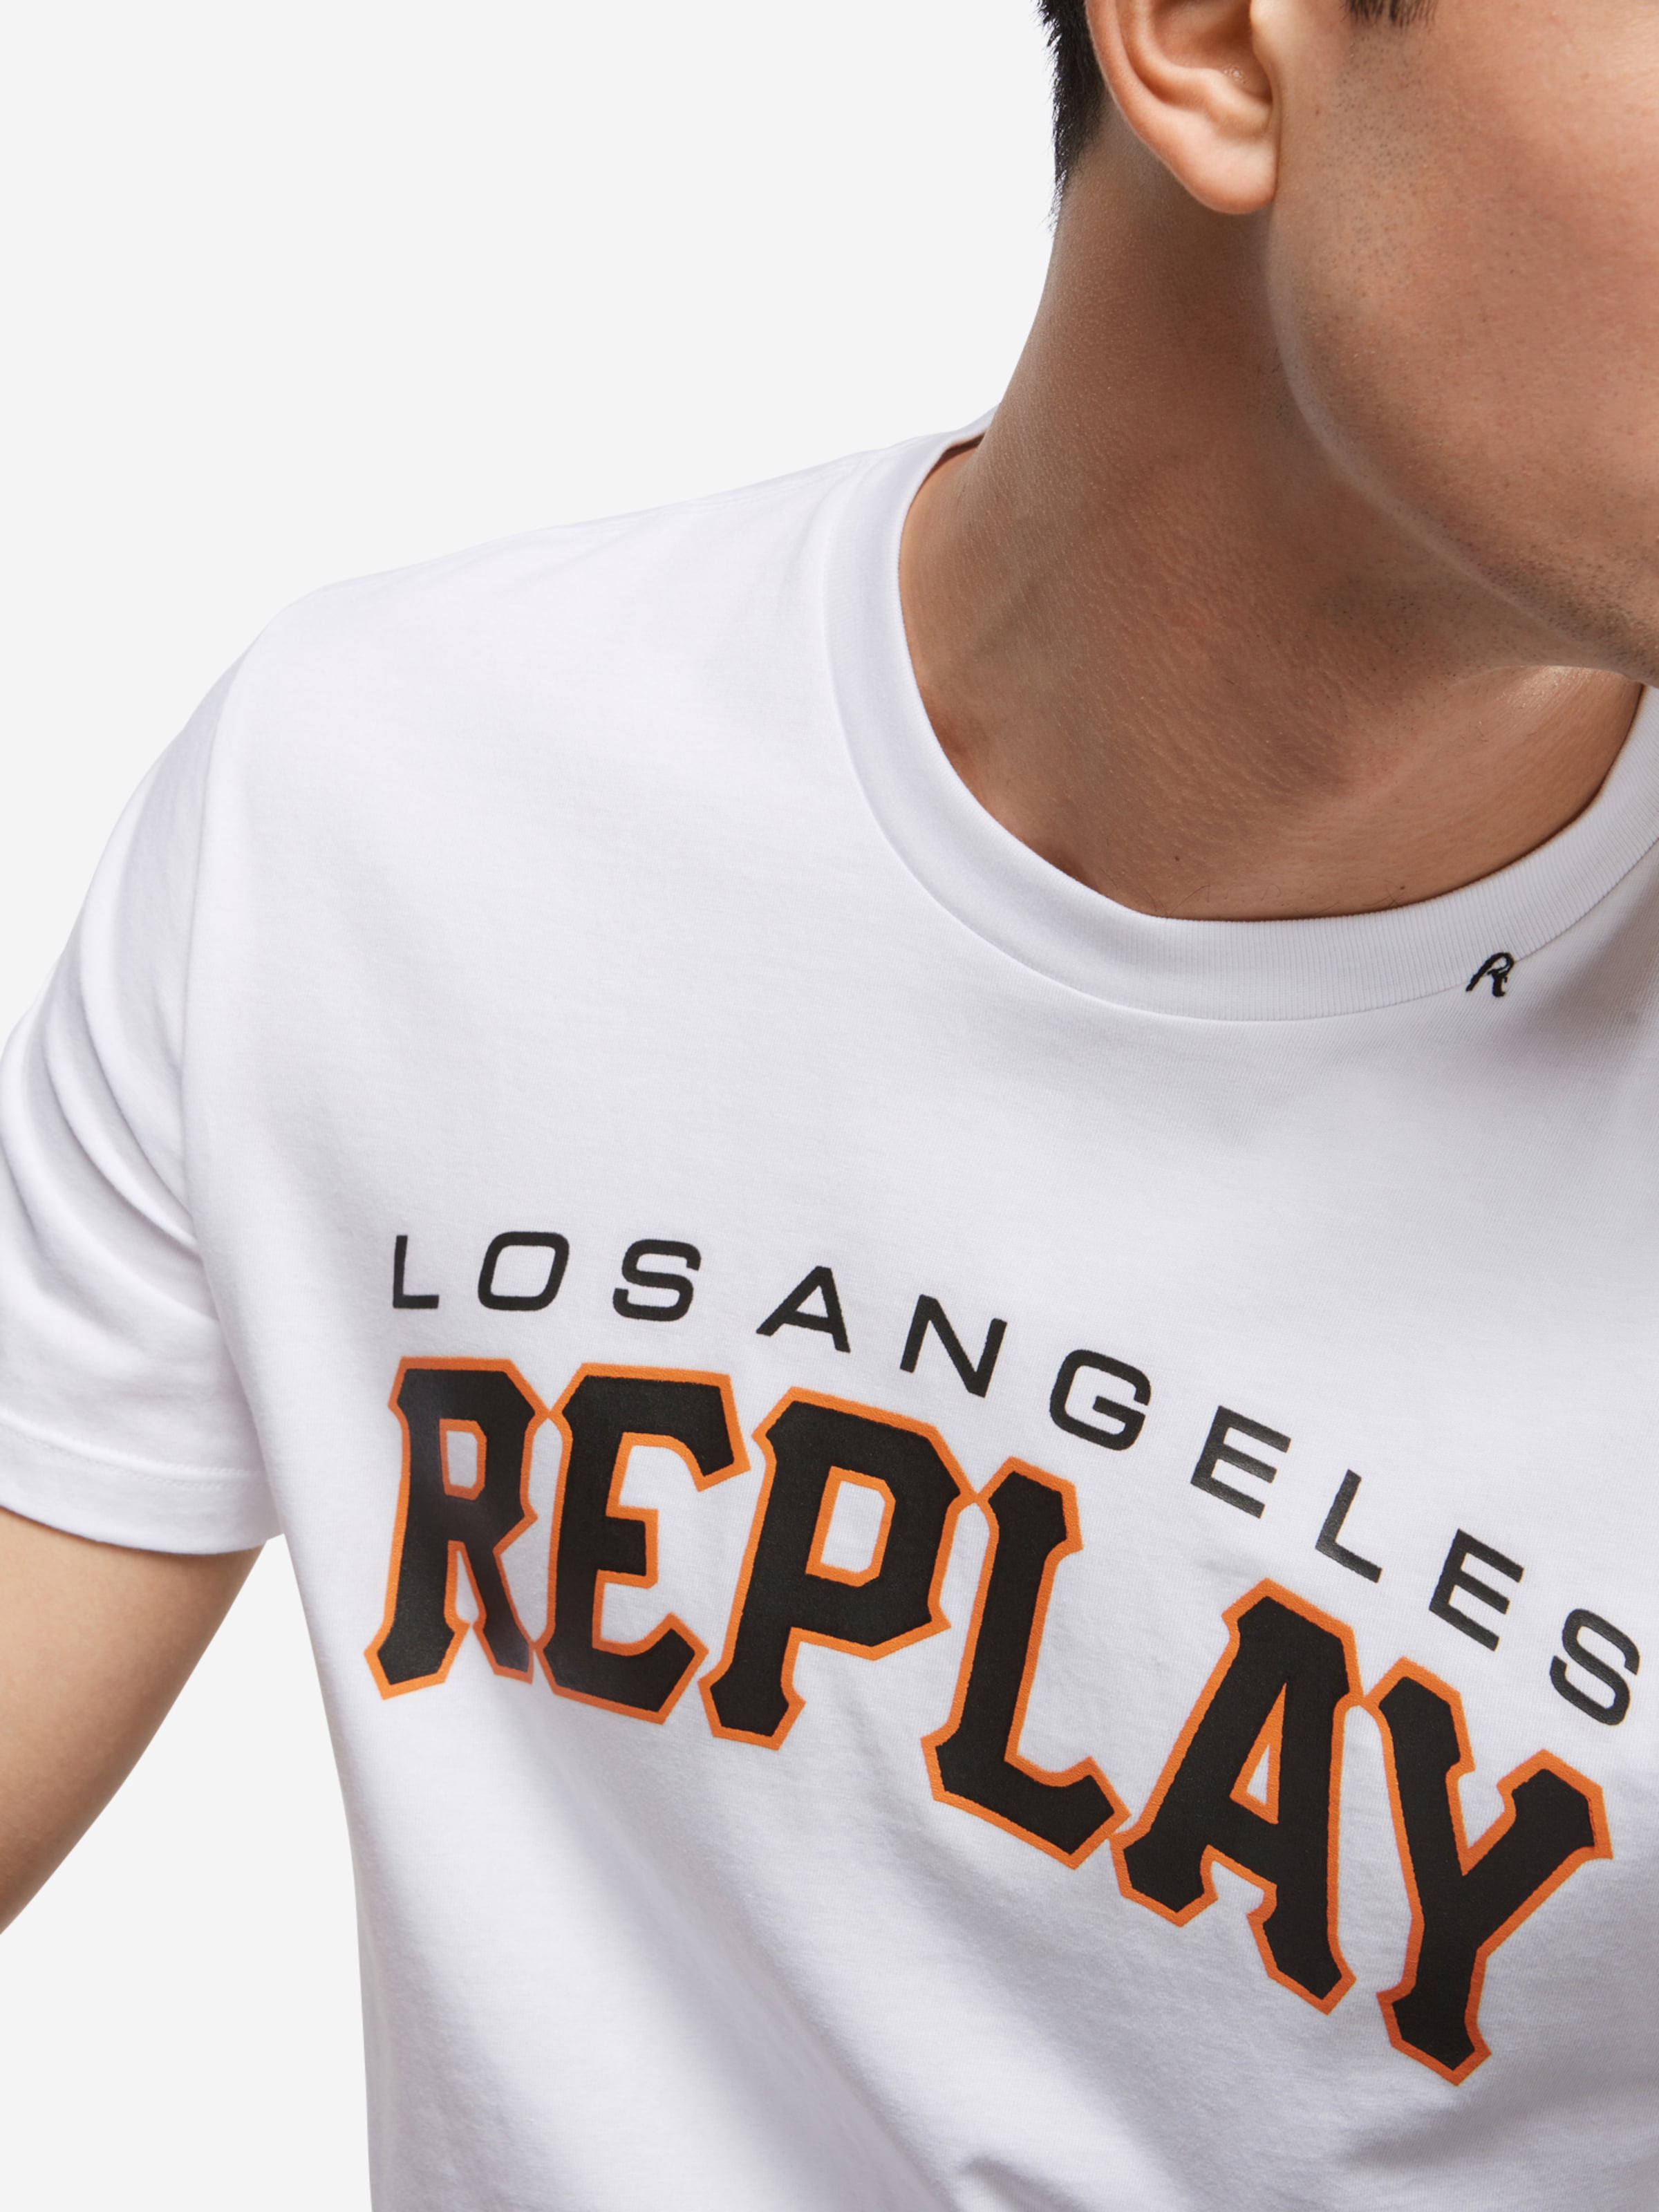 REPLAY T-Shirt Verkauf Online-Shopping Freie Versandrabatte Niedrige Versand Online Verkauf Footaction Online Kaufen AW5LG